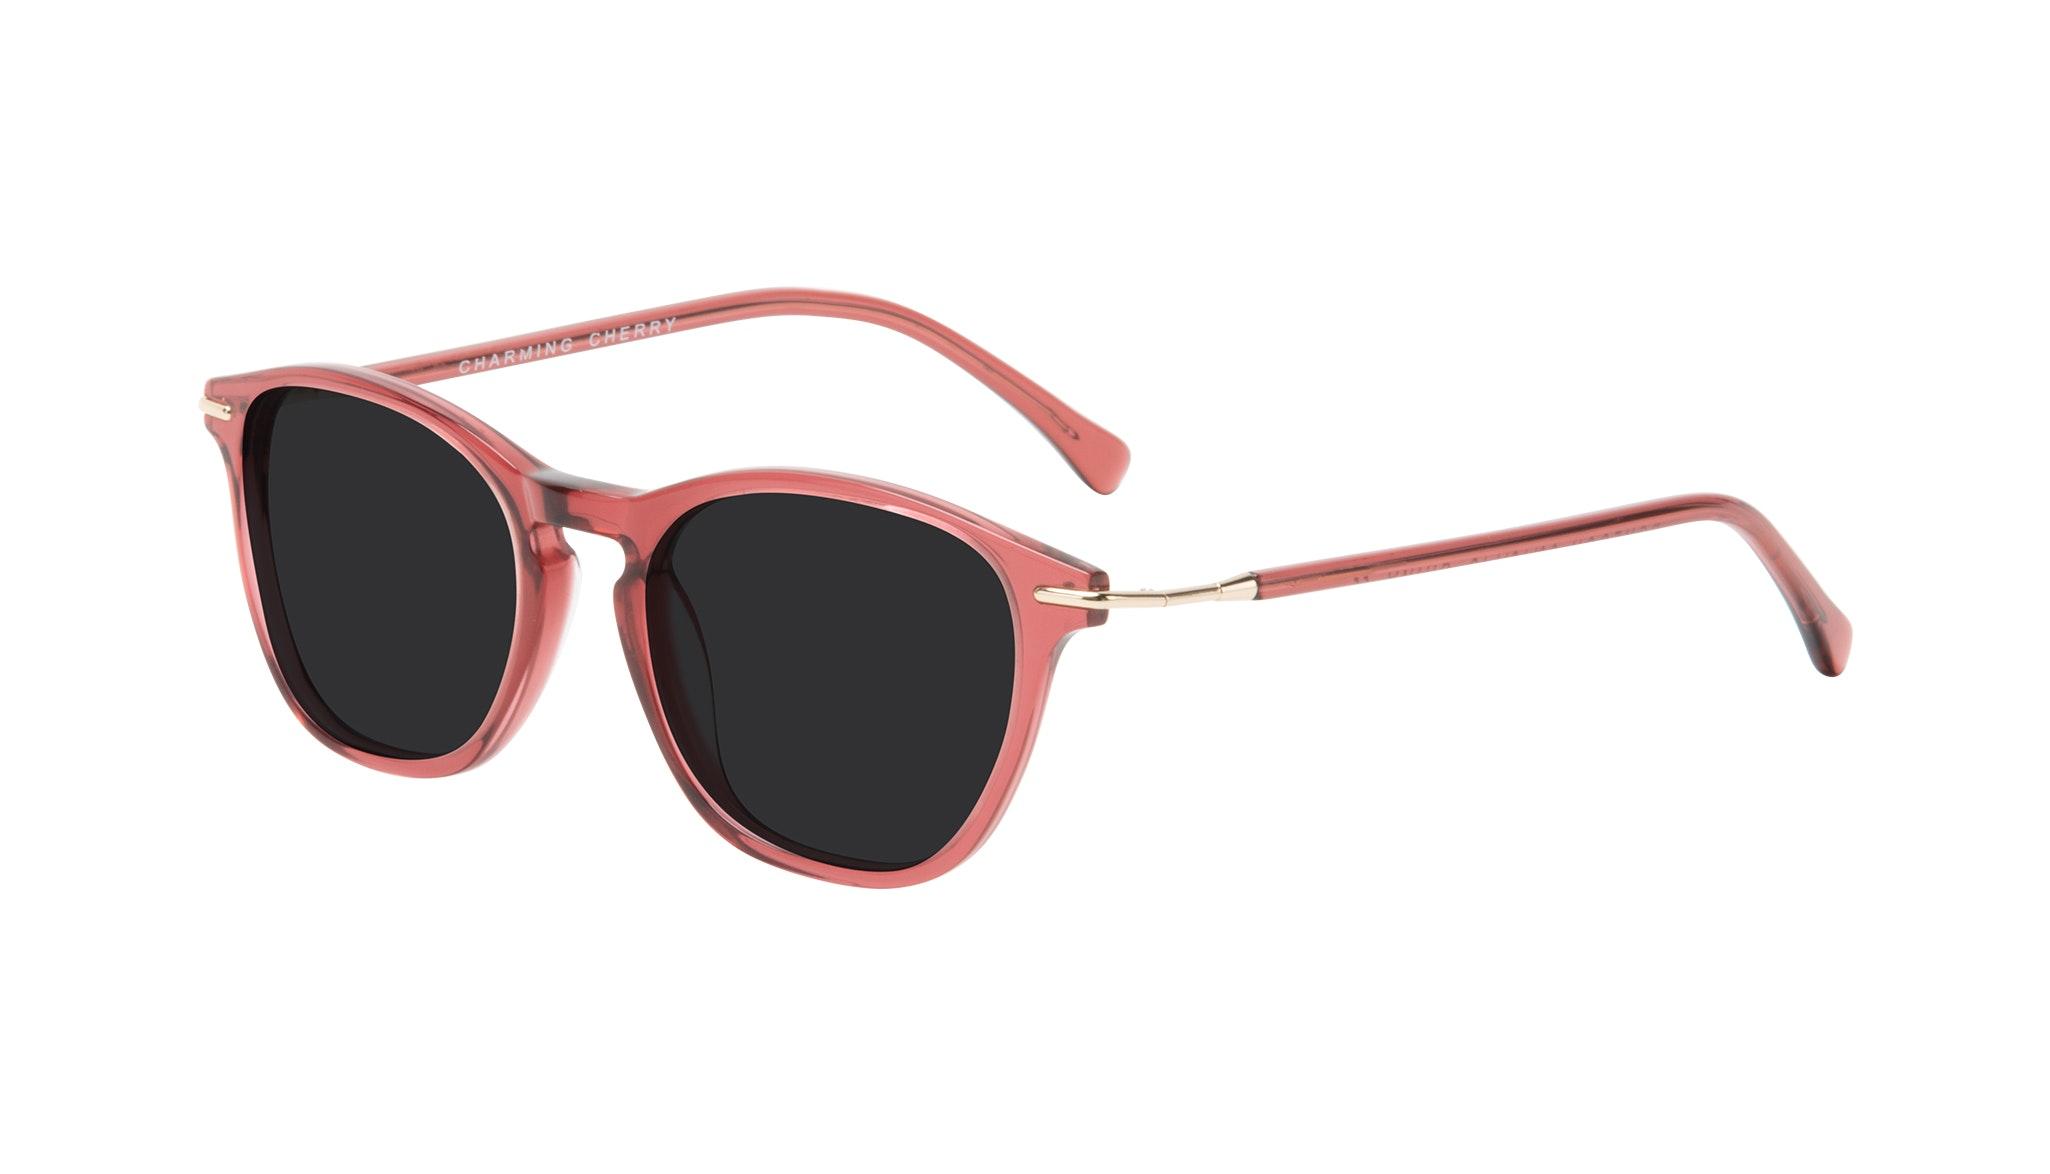 Affordable Fashion Glasses Square Sunglasses Women Charming Cherry Tilt